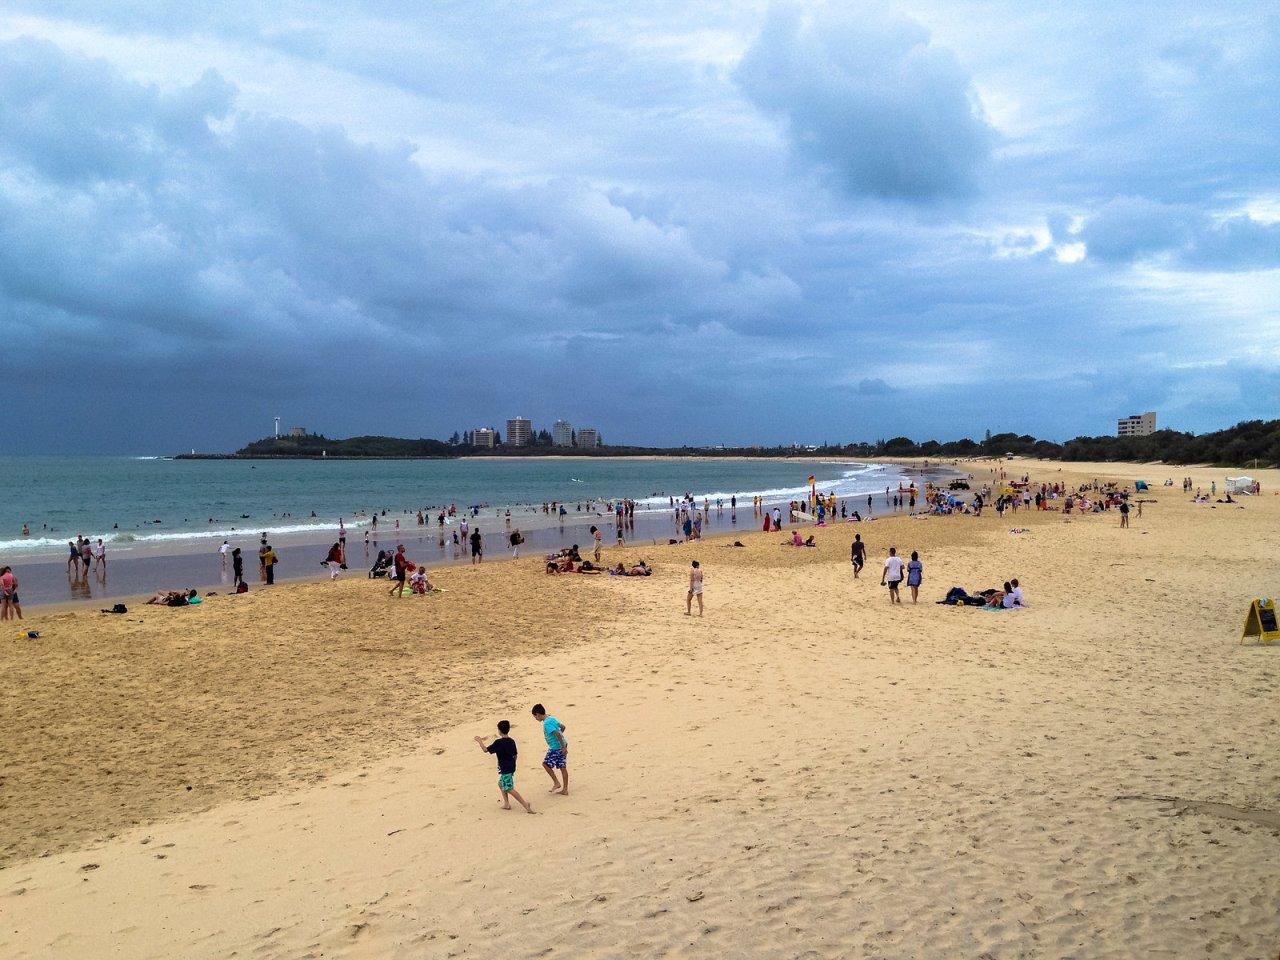 Mooloolaba Beach, Best Beaches in Australia